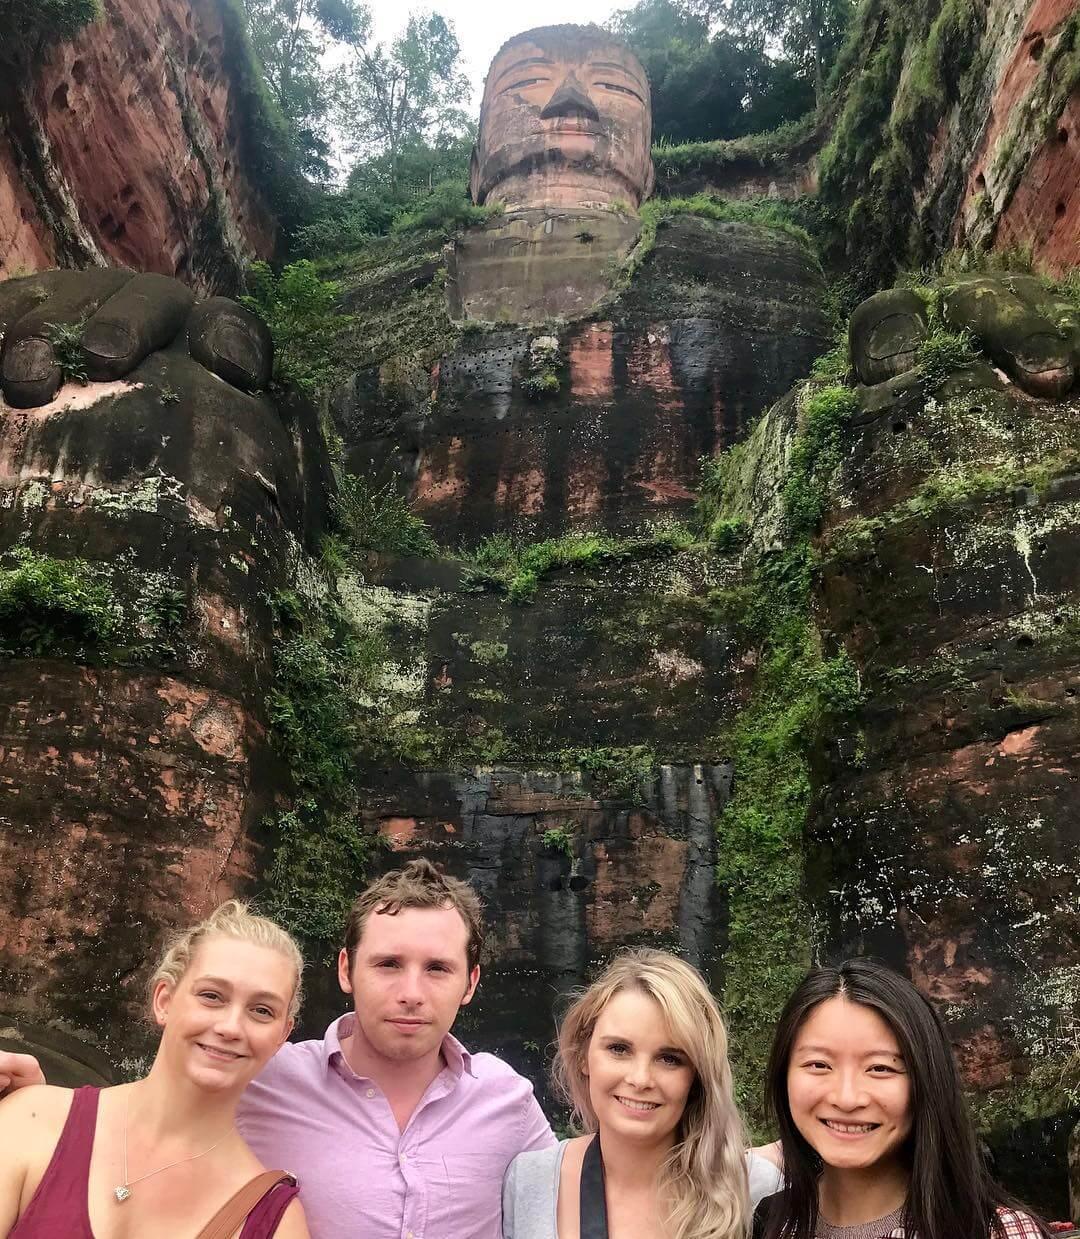 leshan giant buddha tour from chengdu